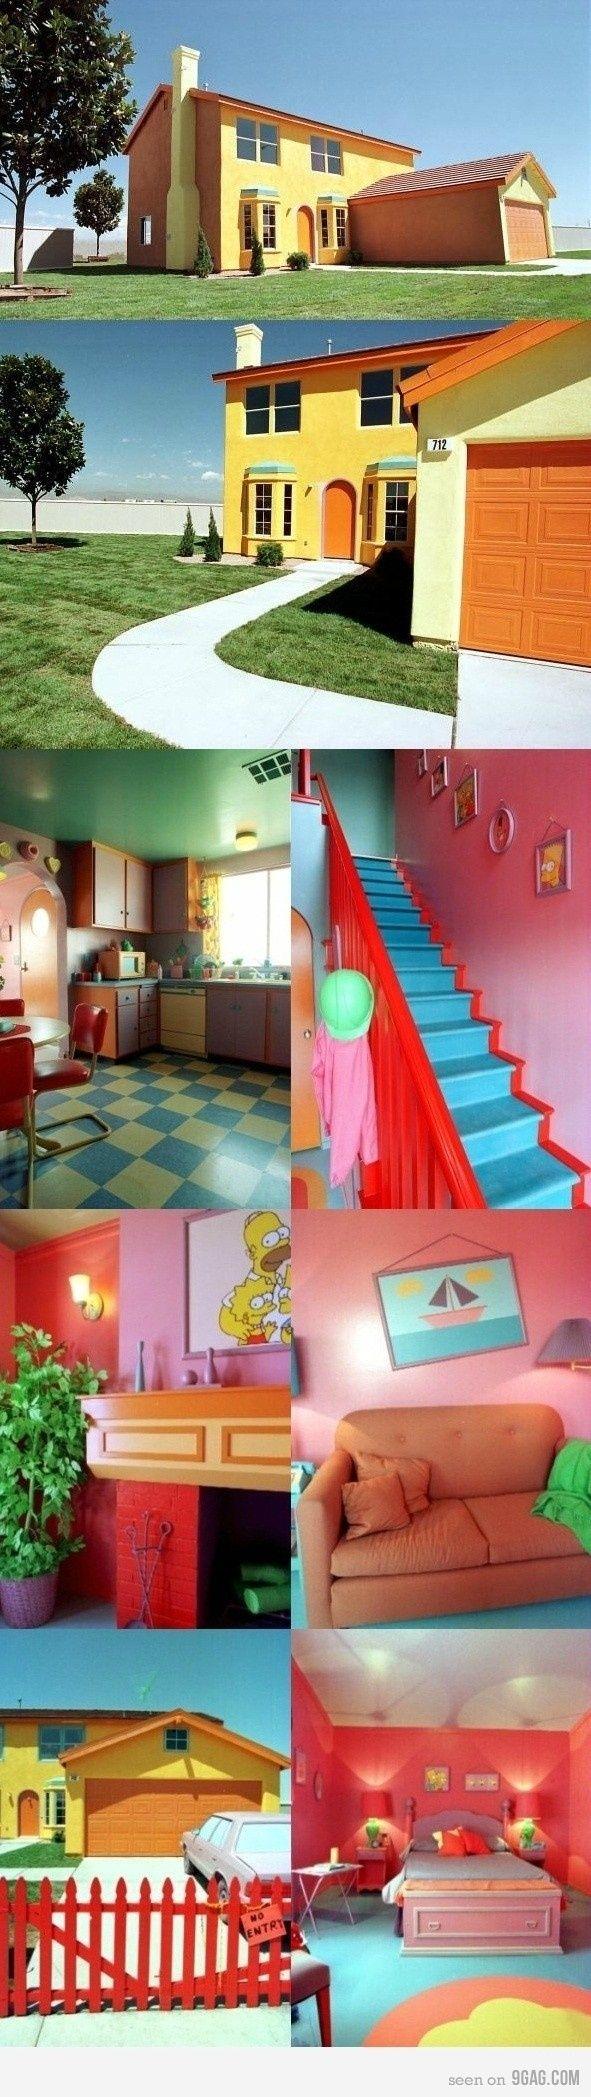 ¡Mira, @MagisterDixit! La casa de los Simpson en la vida real.